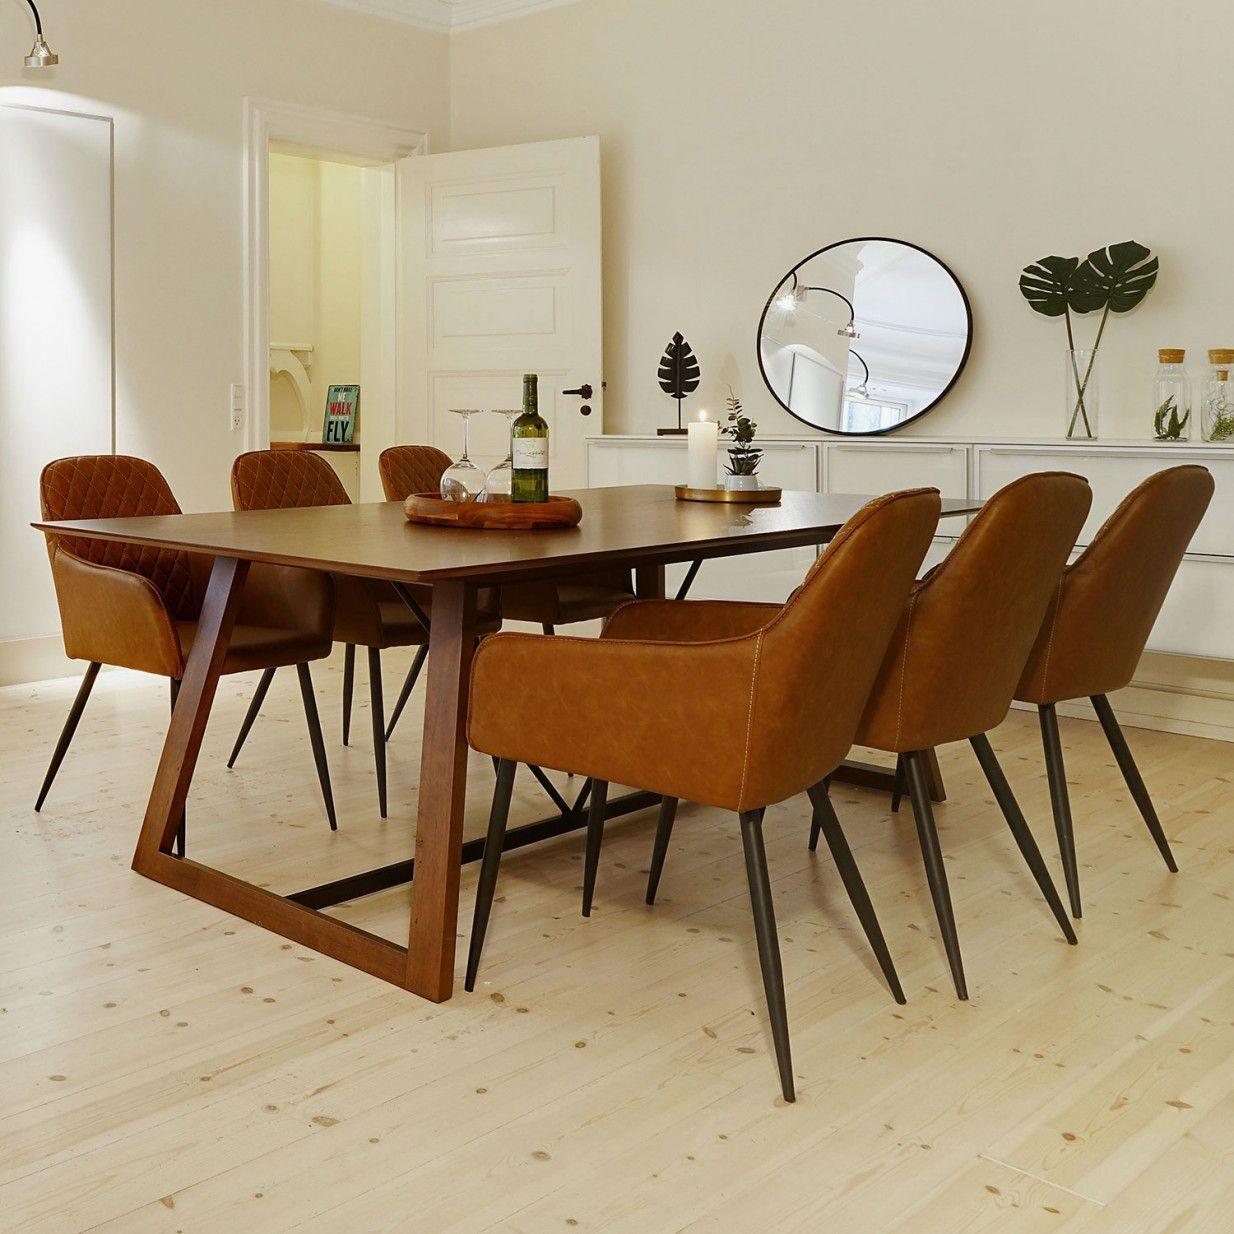 Harbo Stuhl Braun House Nordic Monoqi Sitzgelegenheiten